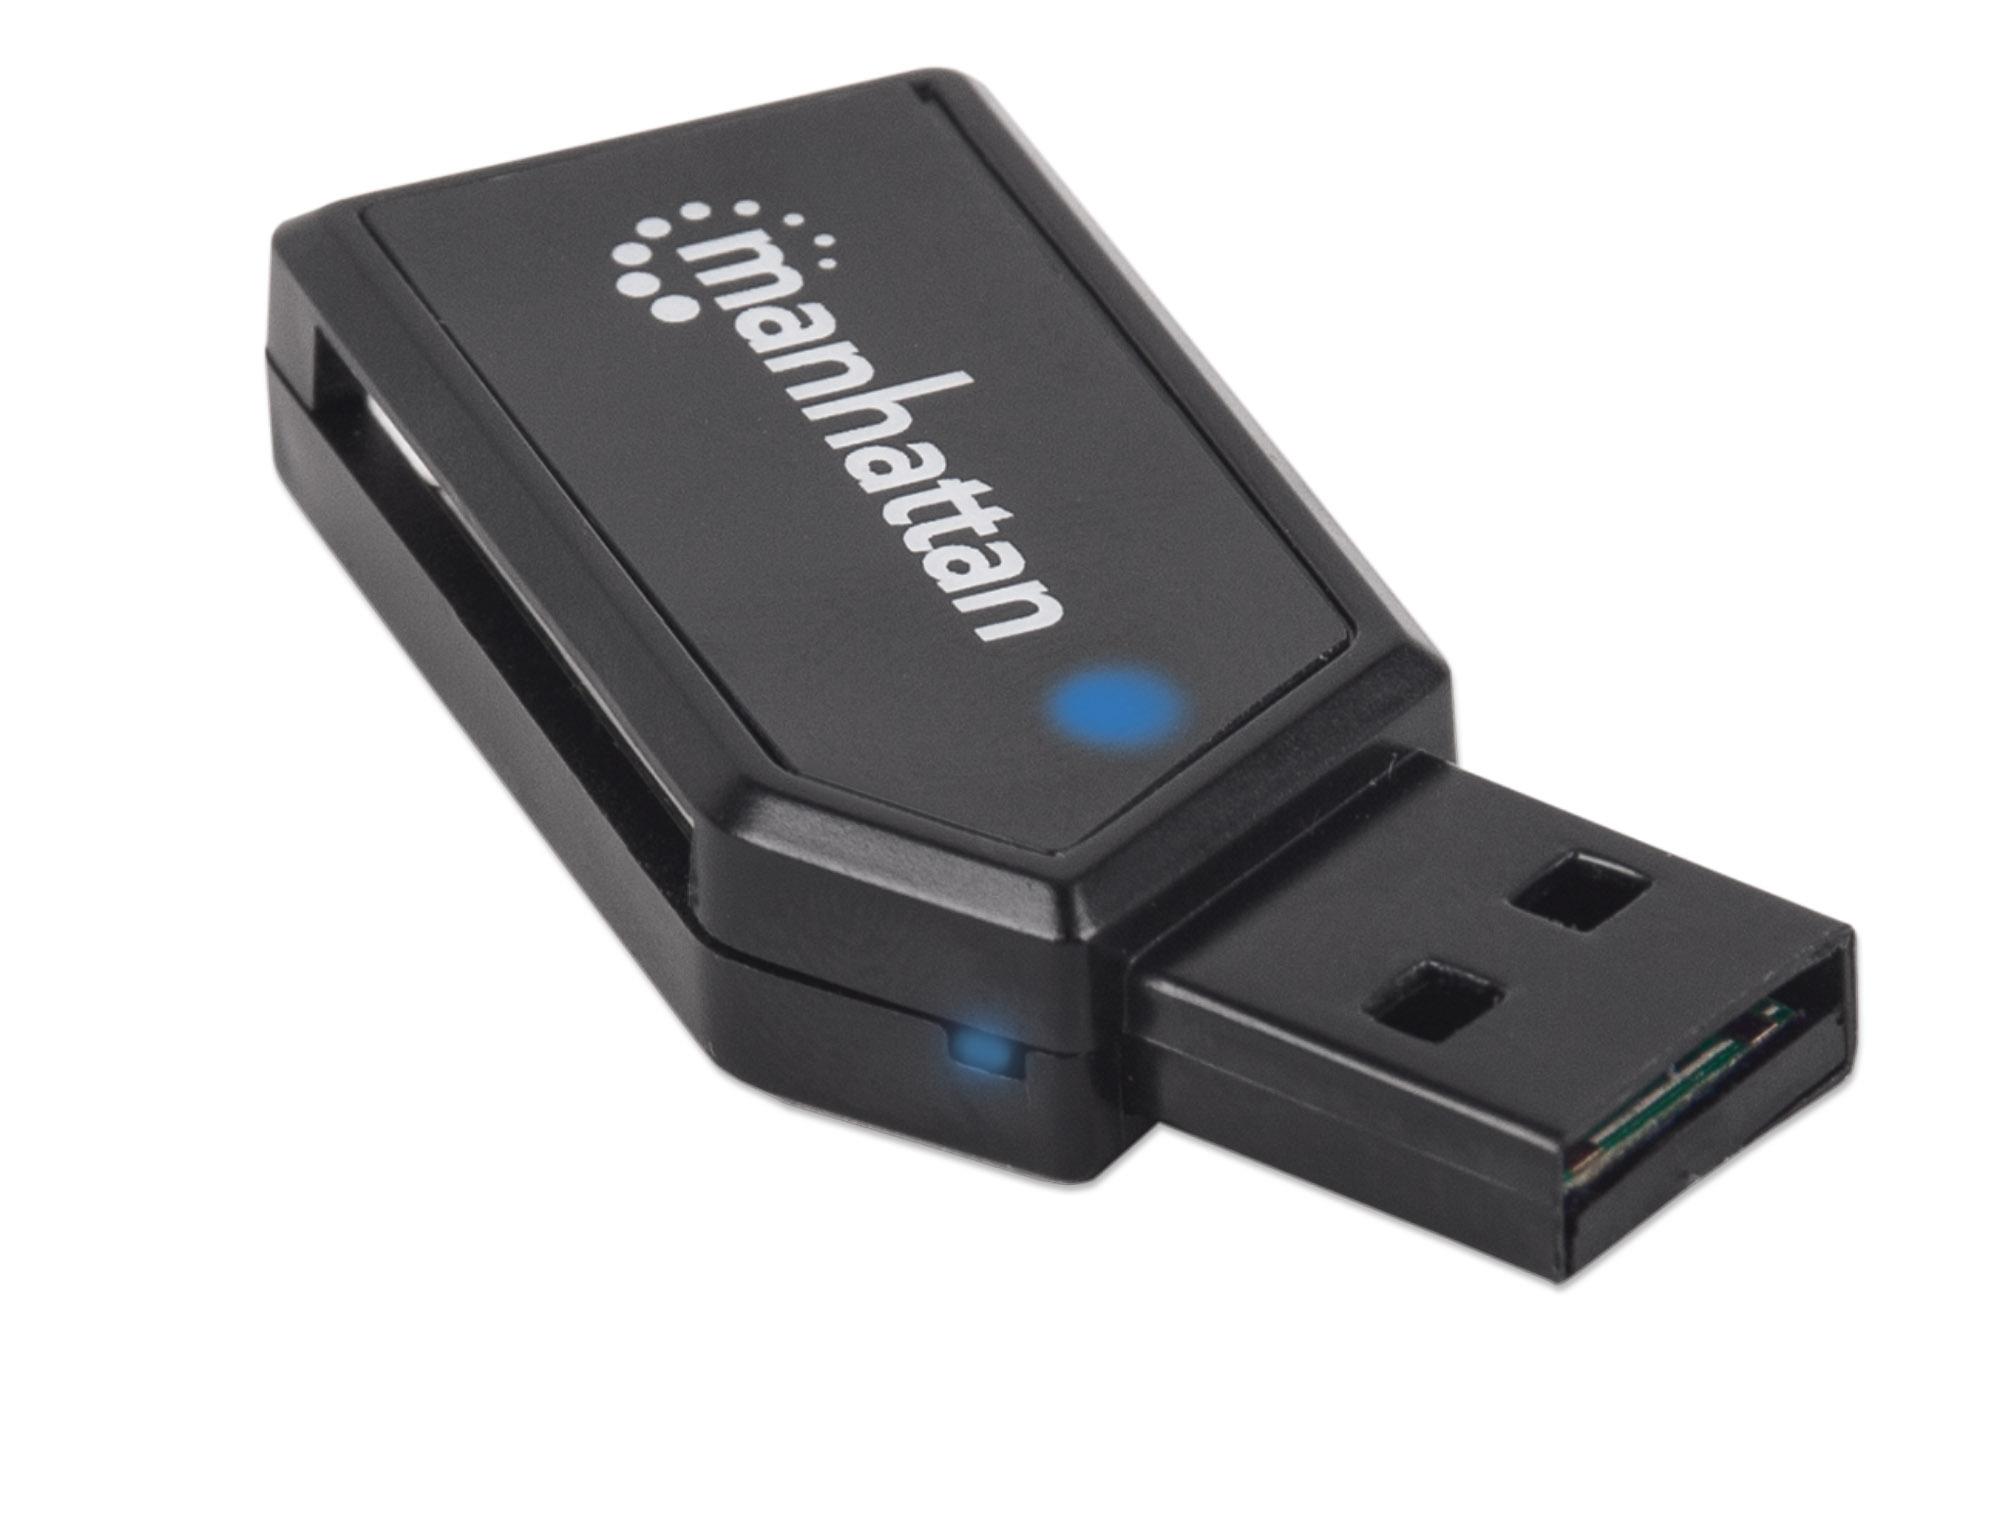 Mini USB 2.0 Multi-Card Reader/Writer